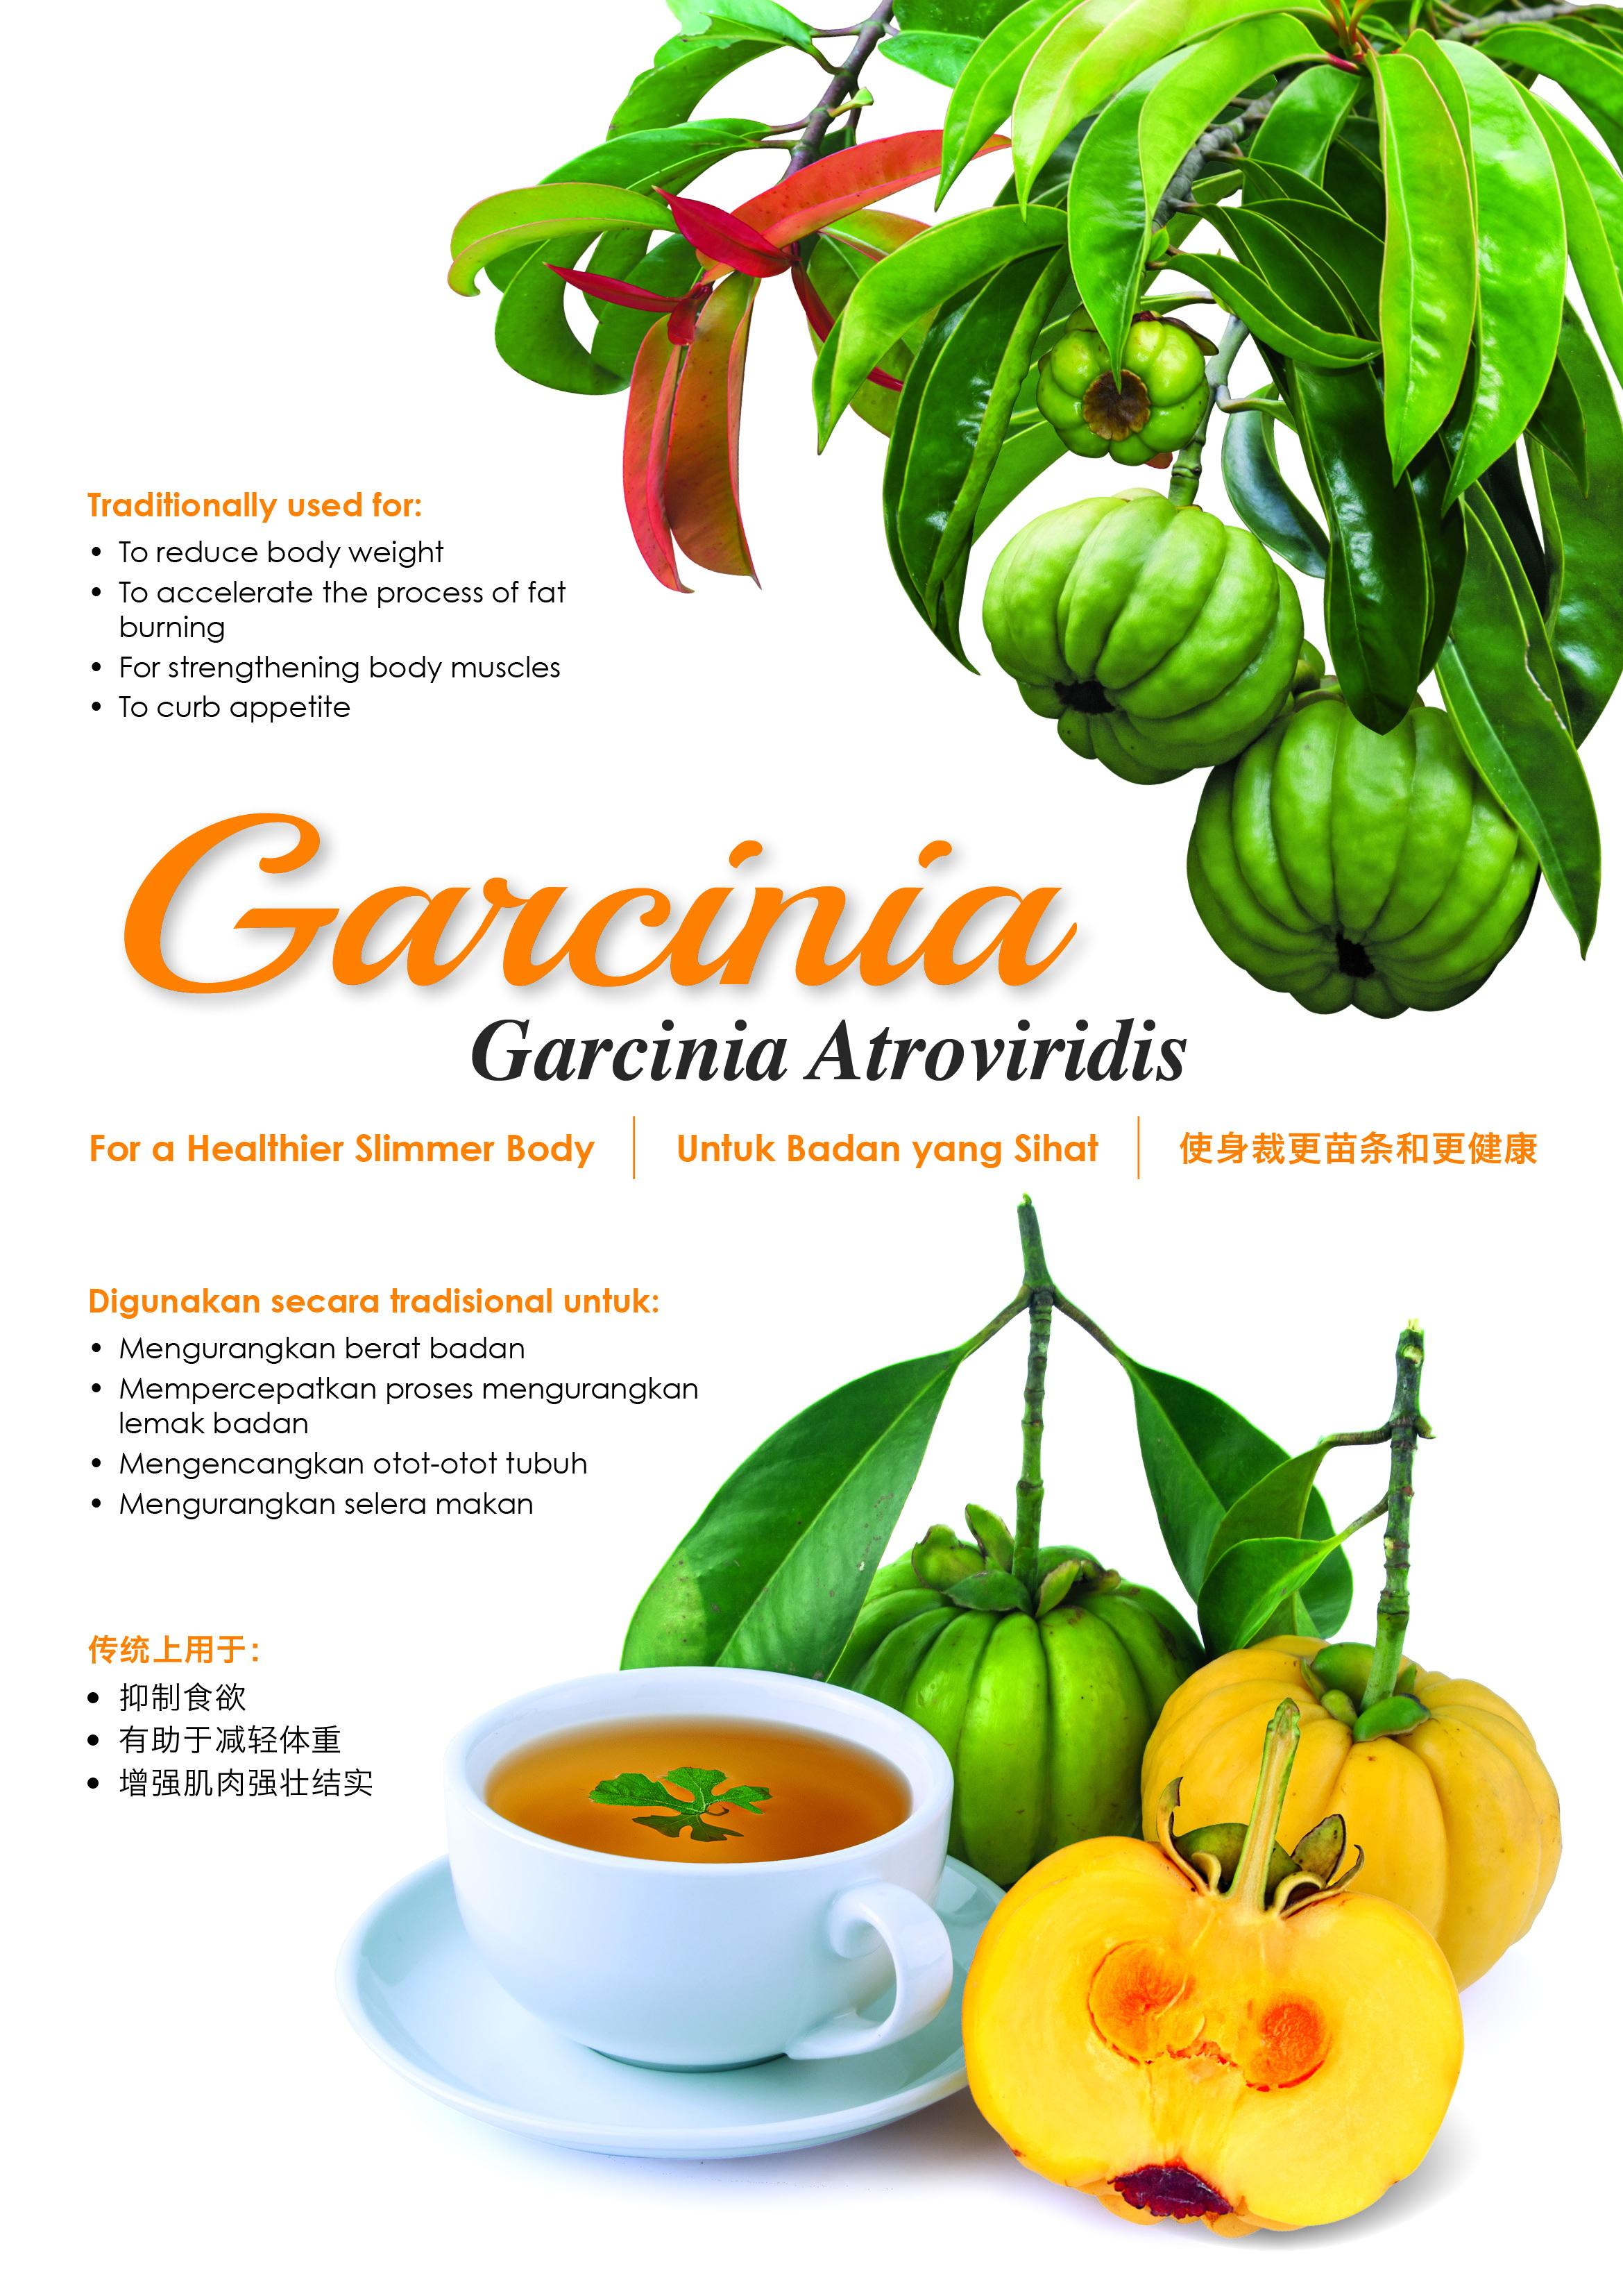 Poster_garcinia_s5pr-wm.jpg?148413267577